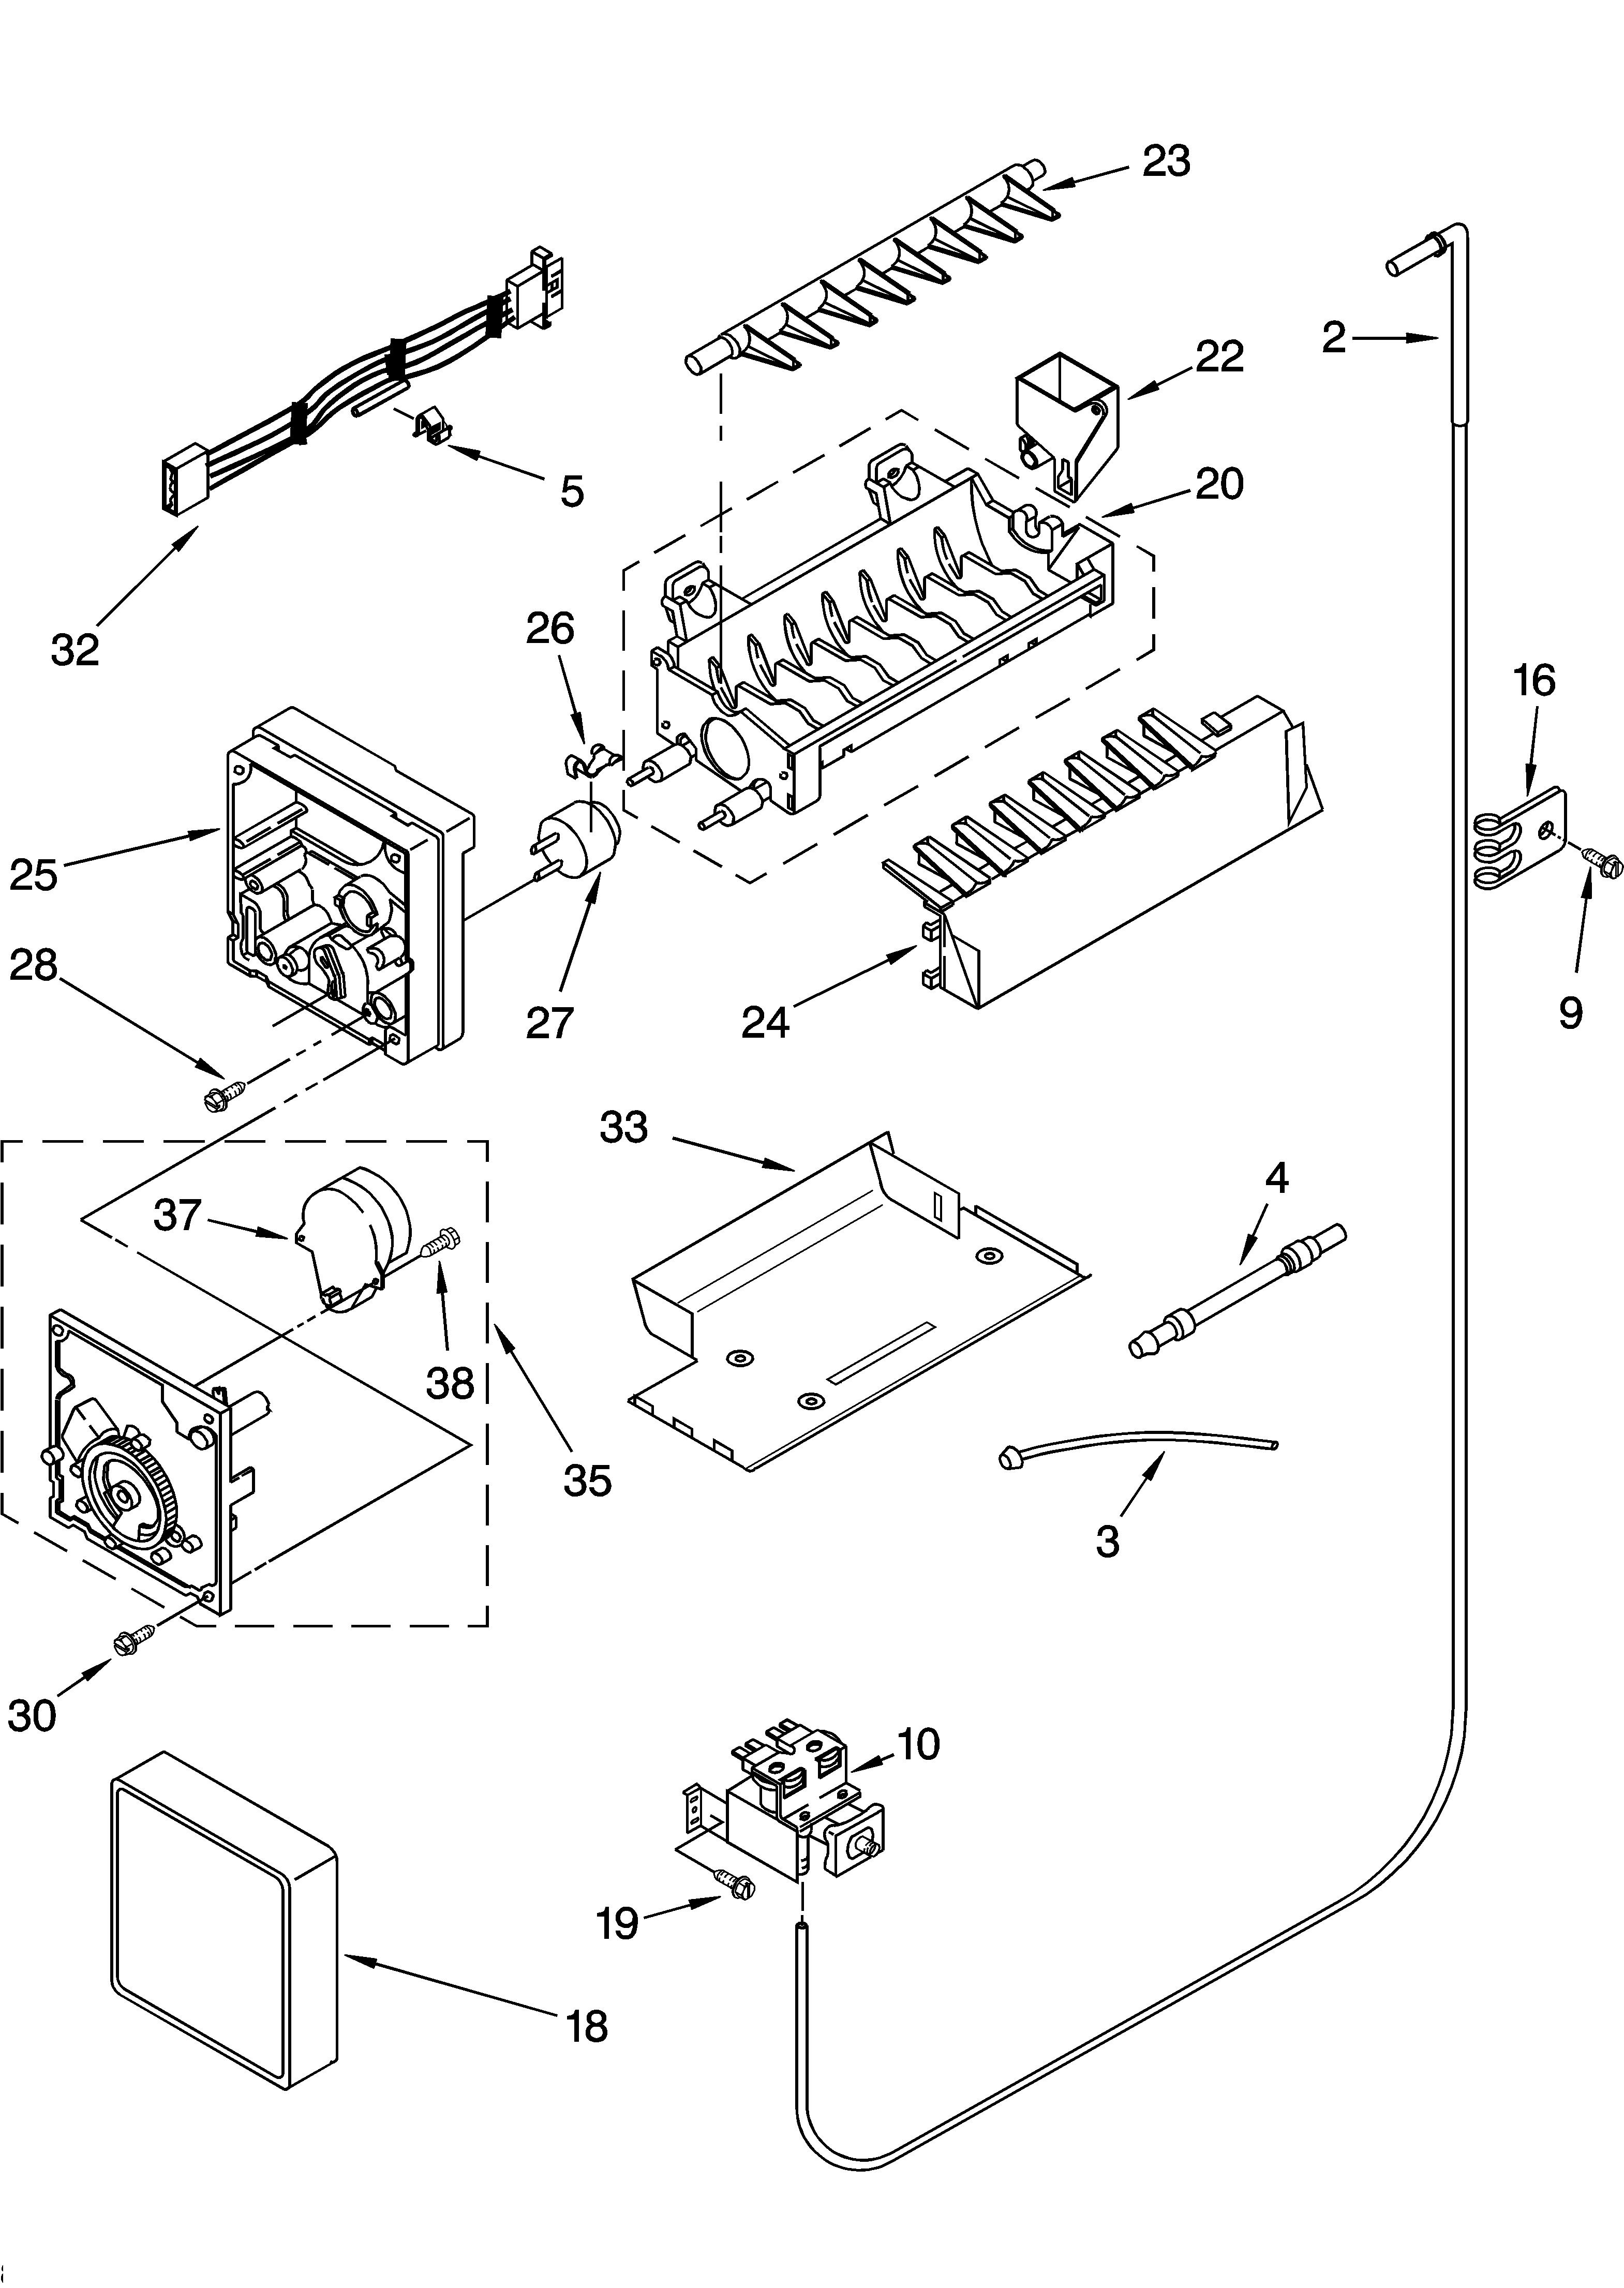 LG_1303] Kitchenaid Refrigerator Wiring Schematic Download DiagramLotap Rdona Lacu Omen Over Vira Mohammedshrine Librar Wiring 101